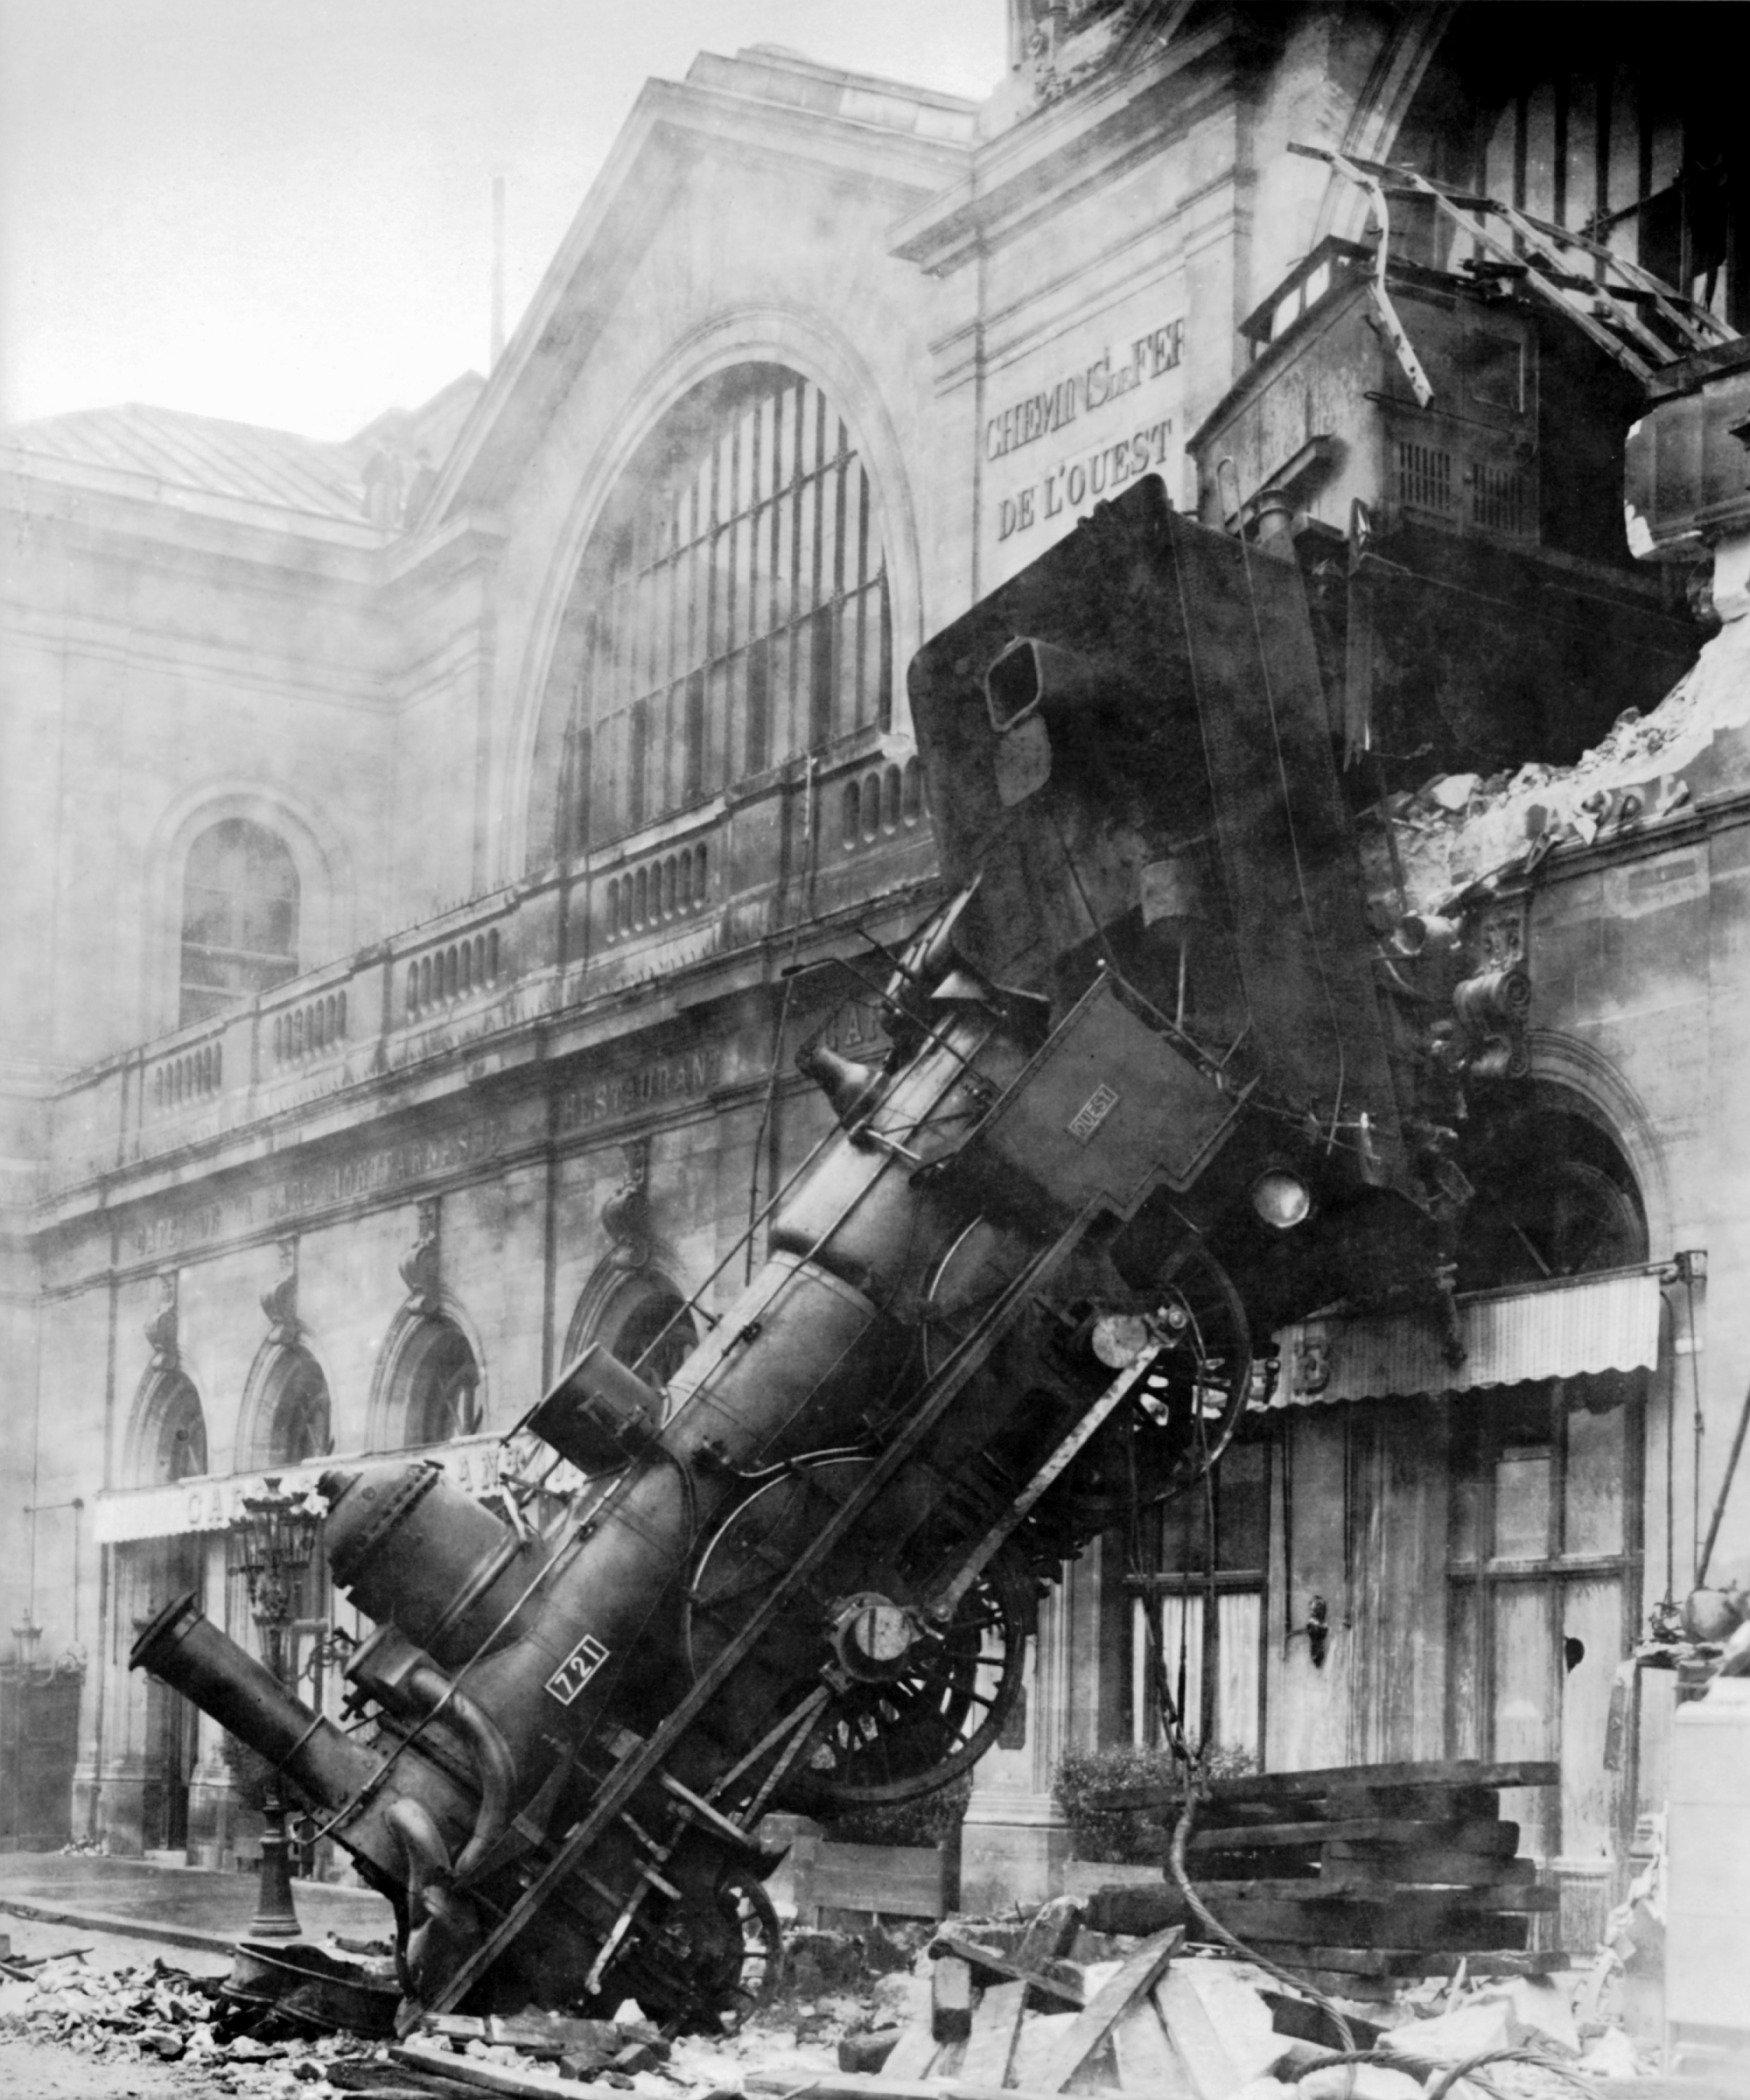 Accident ferroviaire gare de Montparnasse 23/10/1895